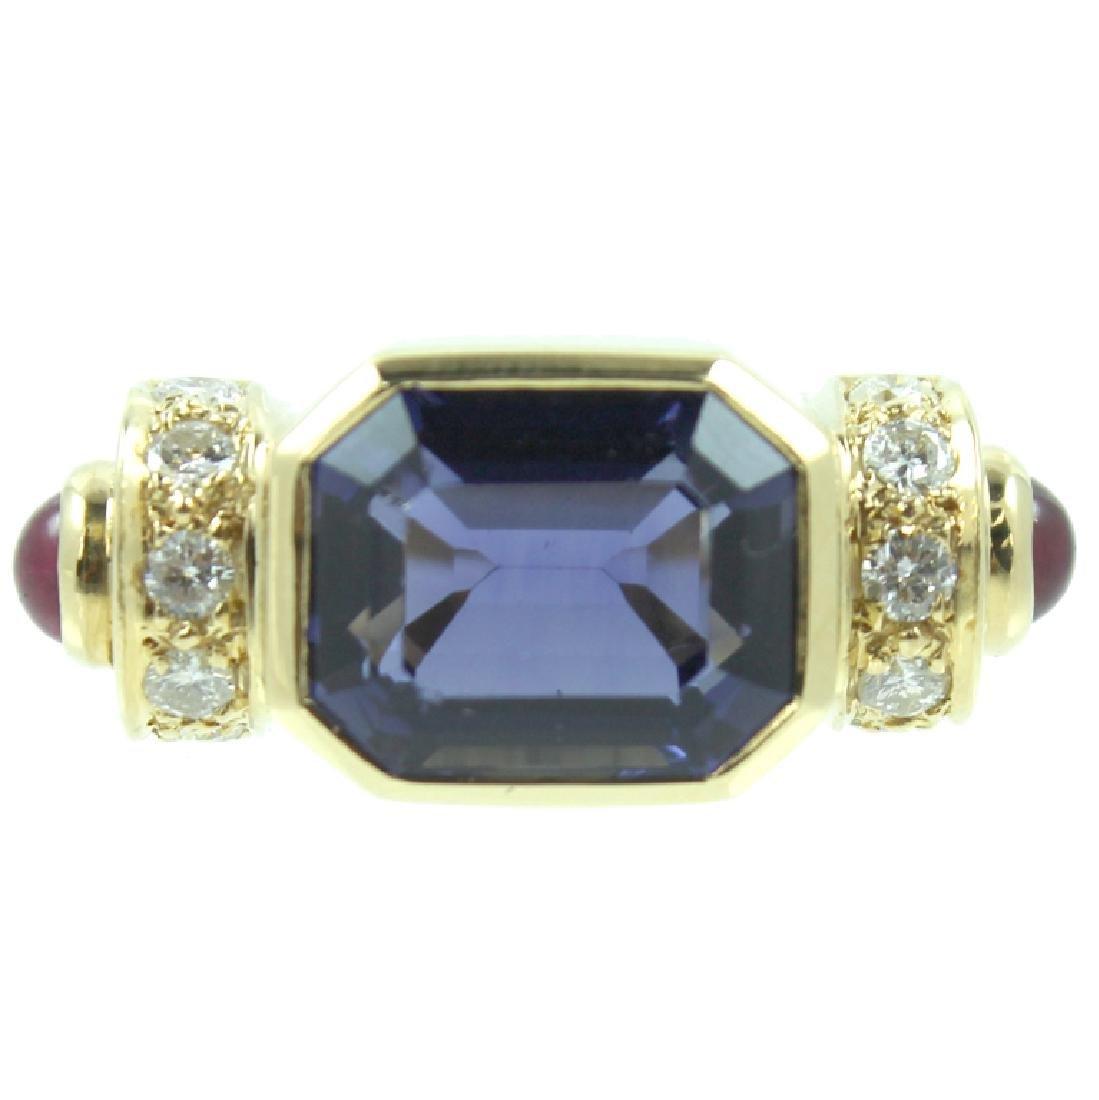 ESTATE LOLITE RUBY & DIAMOND RING - 2